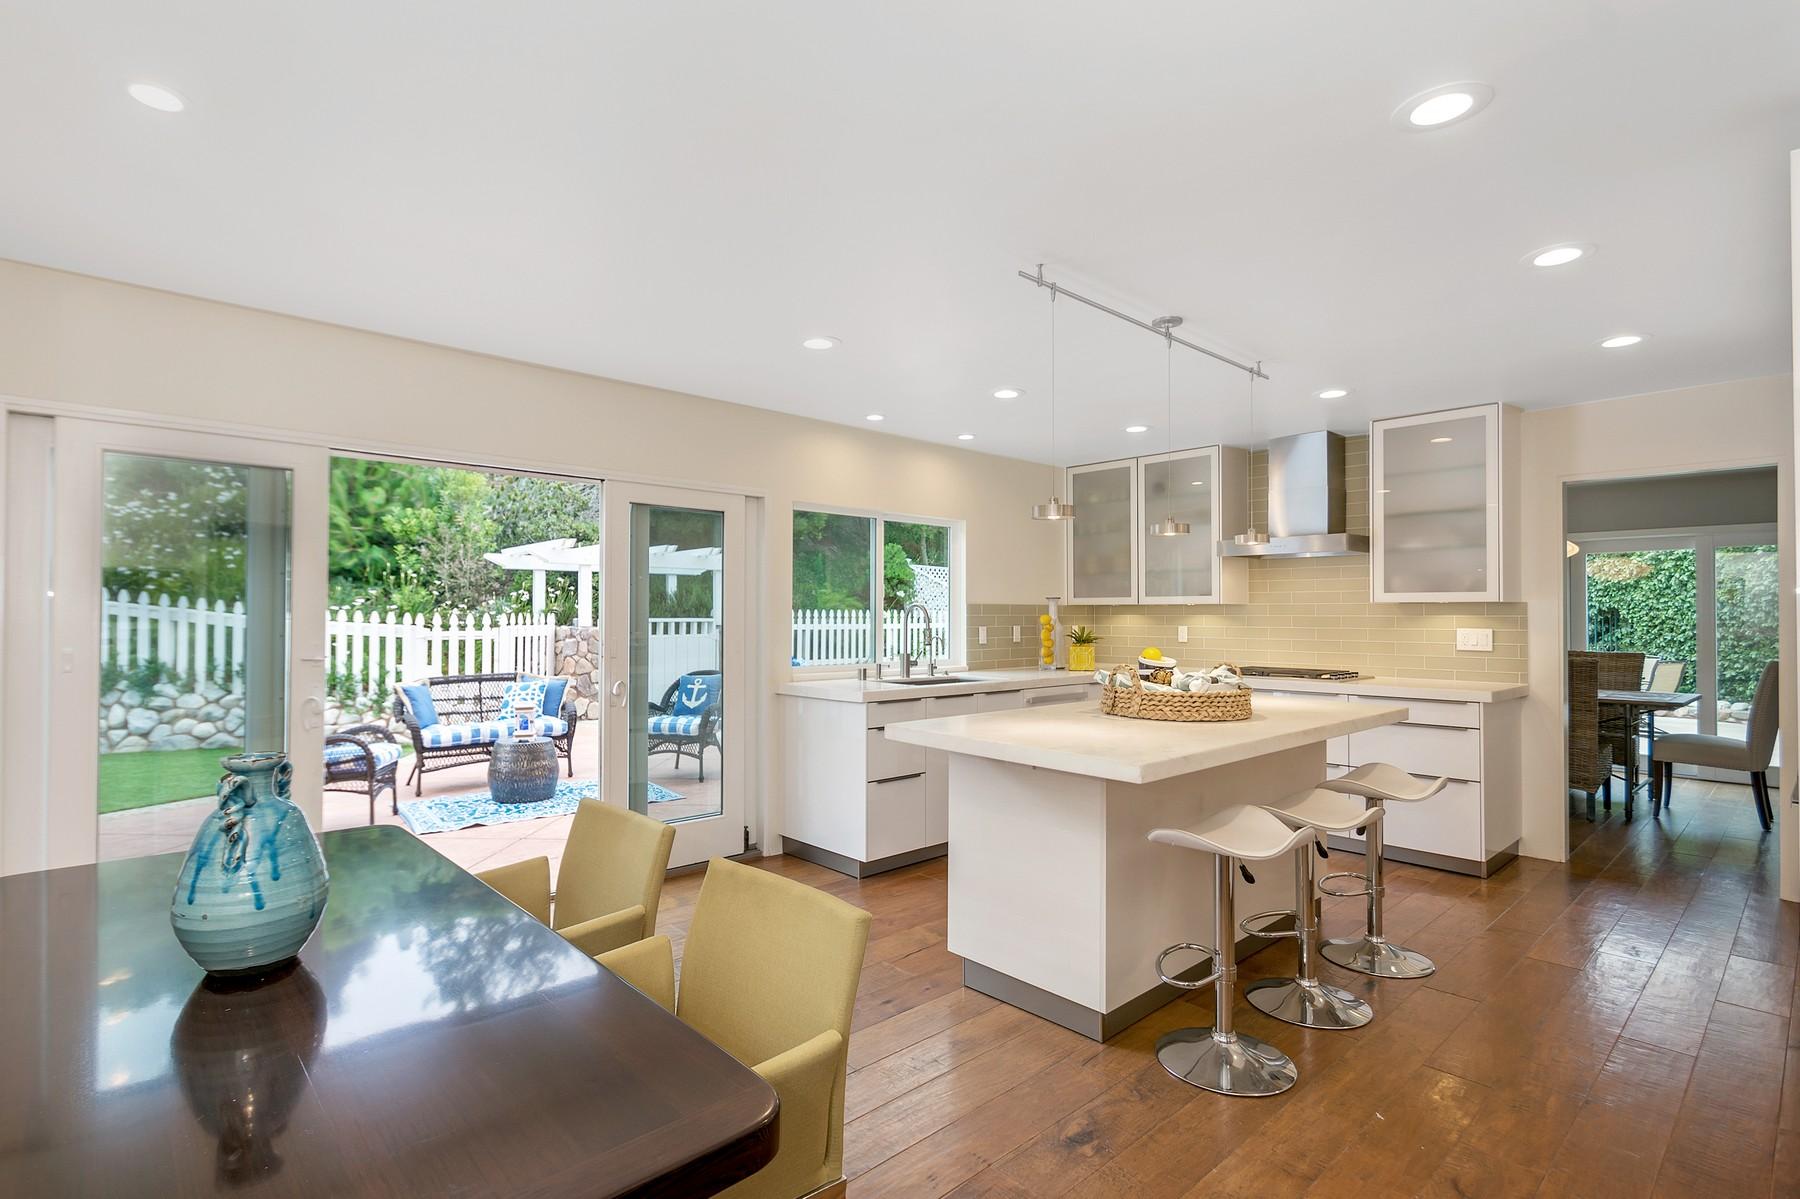 Single Family Home for Sale at 2875 Sugarman Way La Jolla, California, 92037 United States